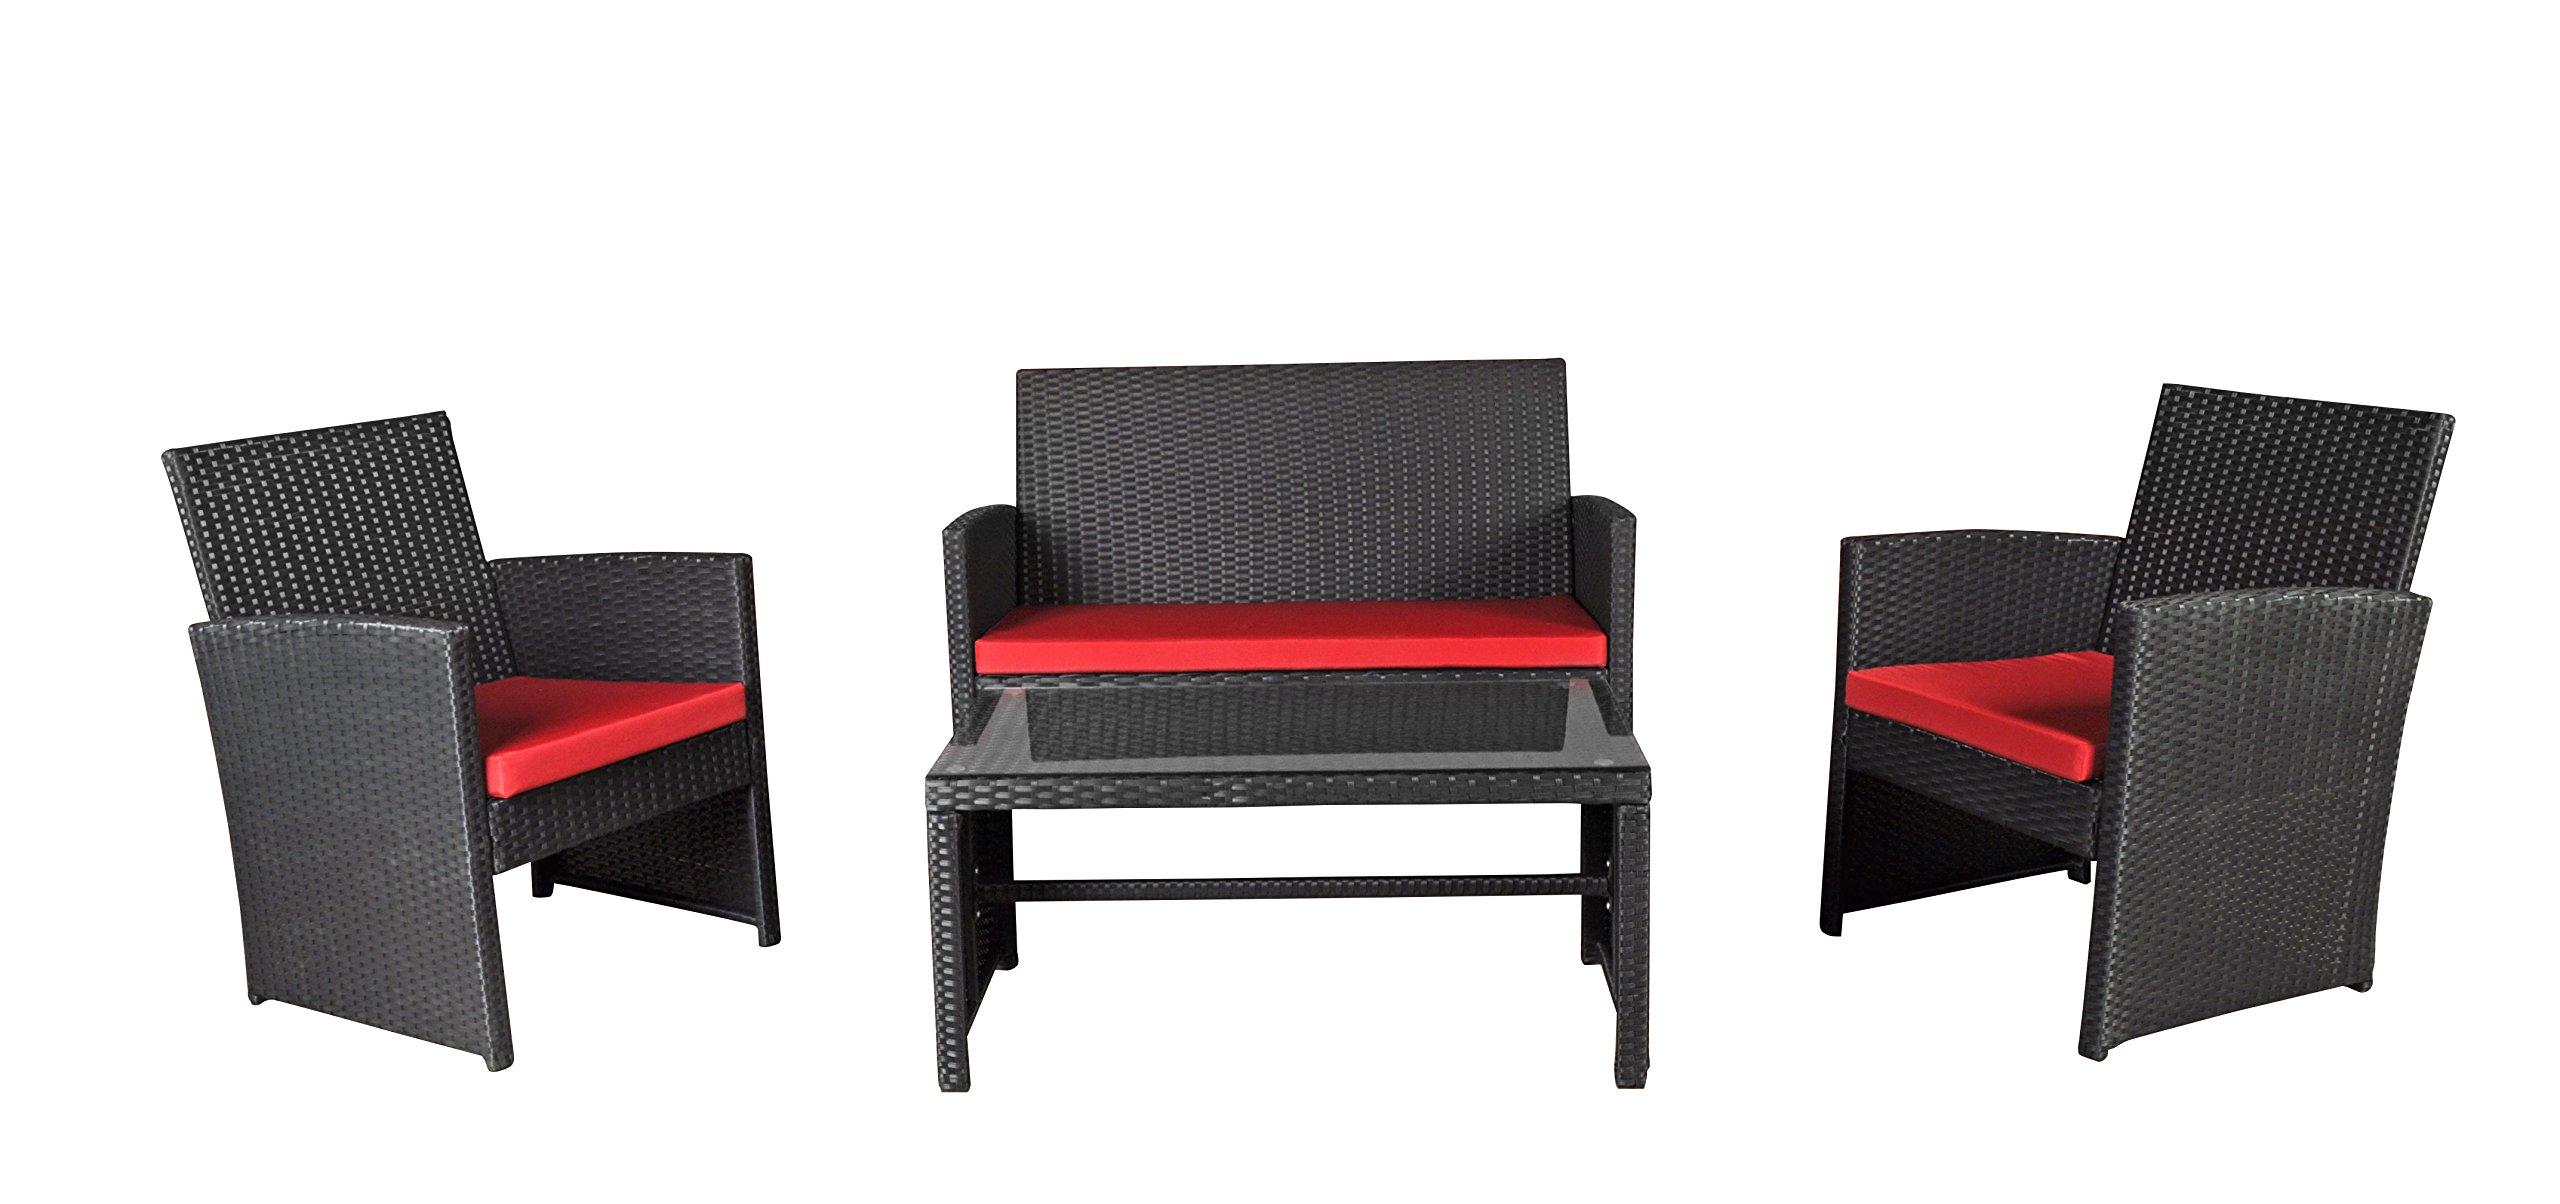 Modern Outdoor Garden, Patio 4 Piece Seat - Wicker Sofa Furniture Set (Black)